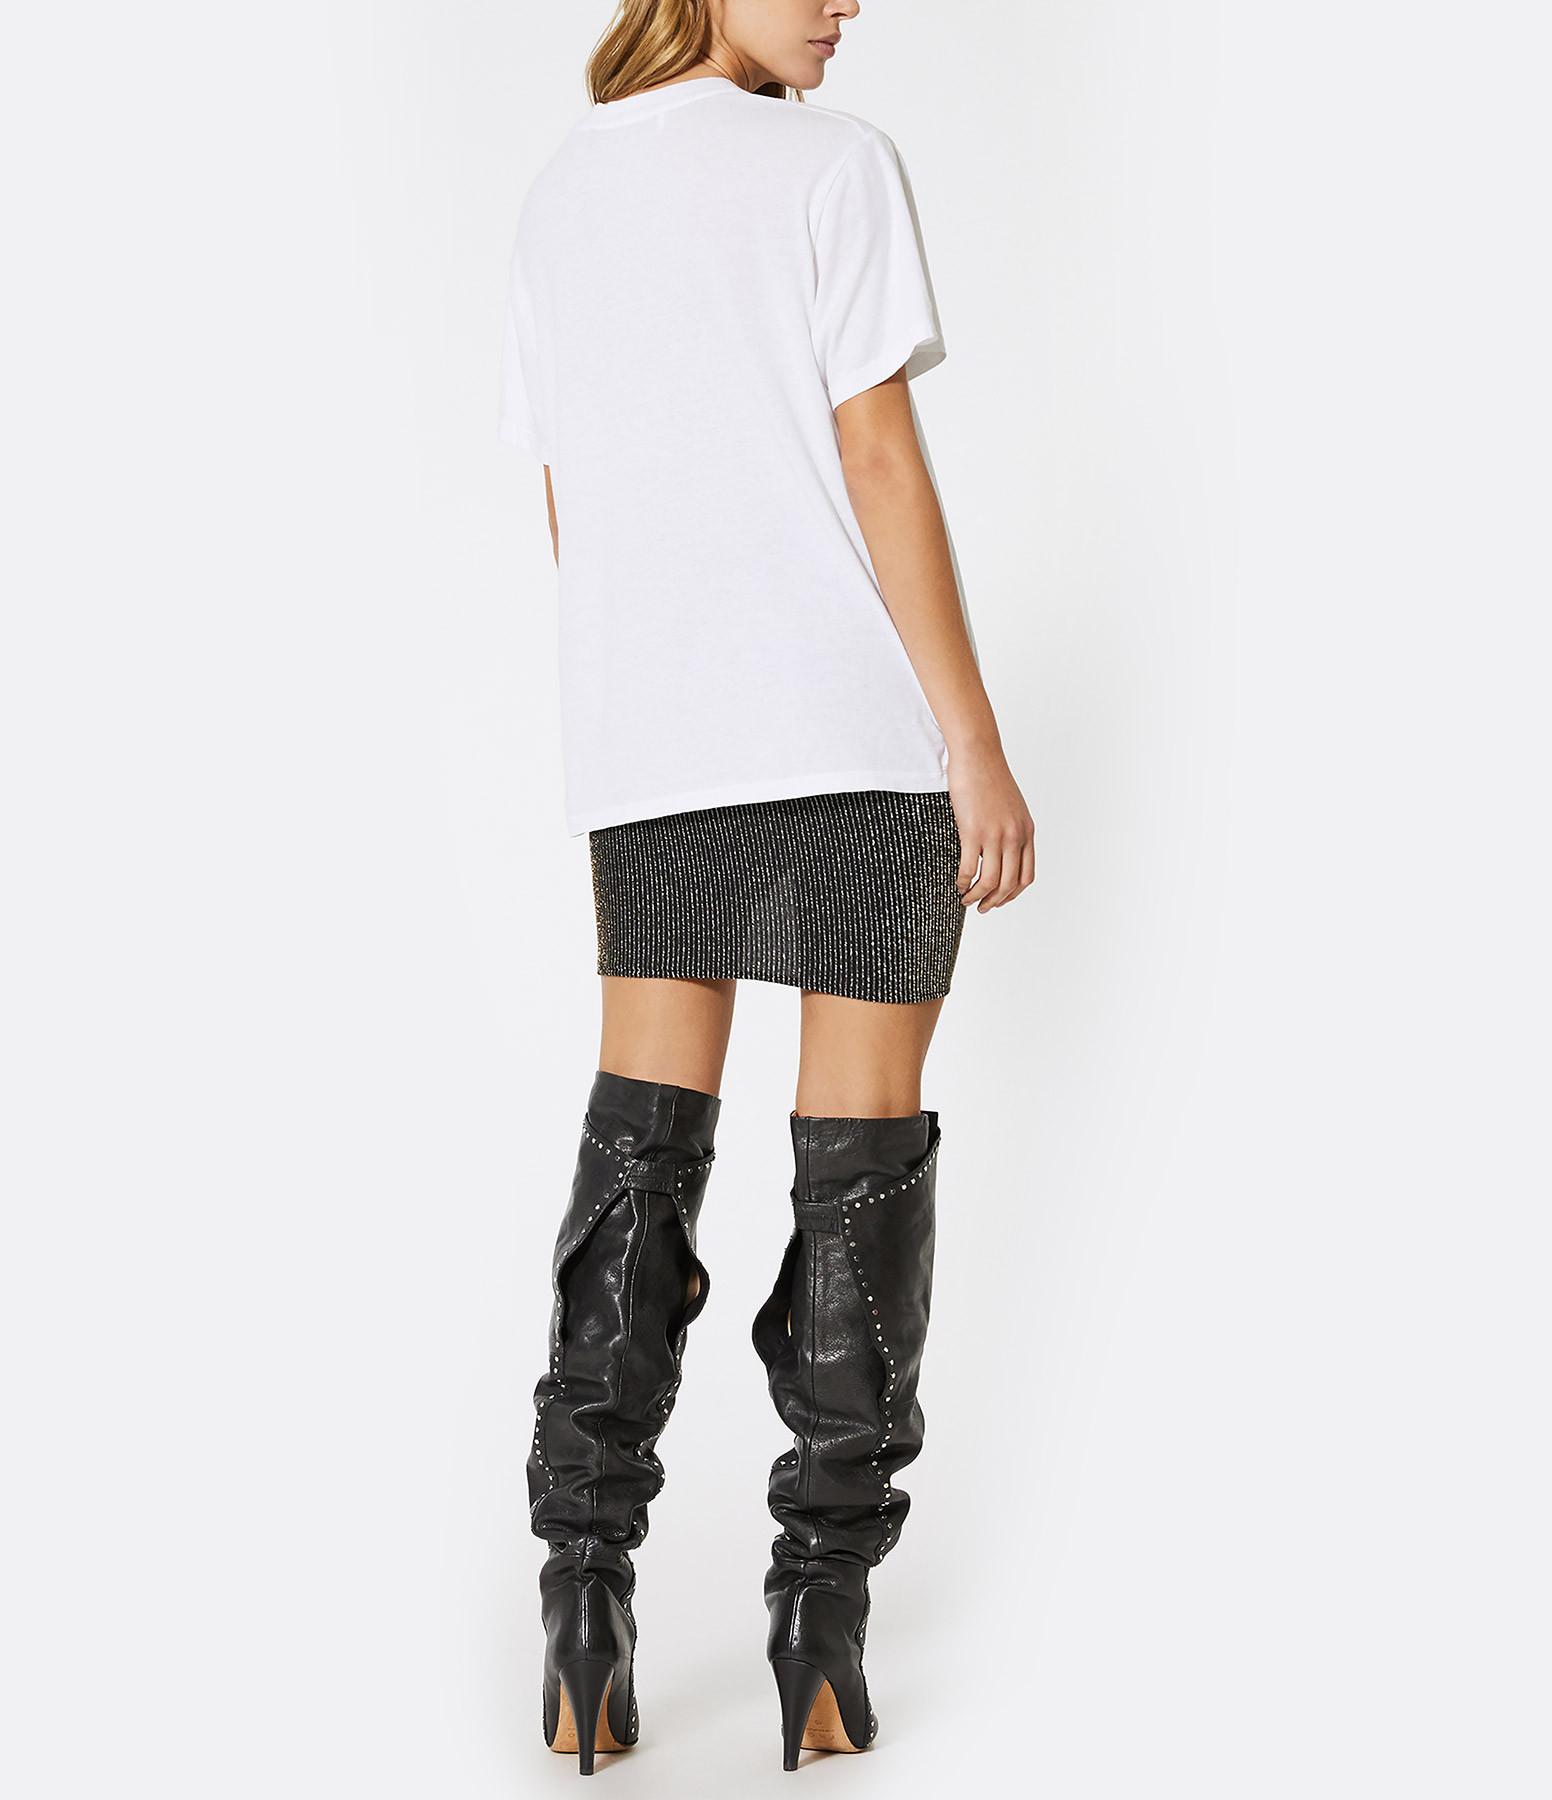 IRO - Tee-shirt Maryna Coton Blanc